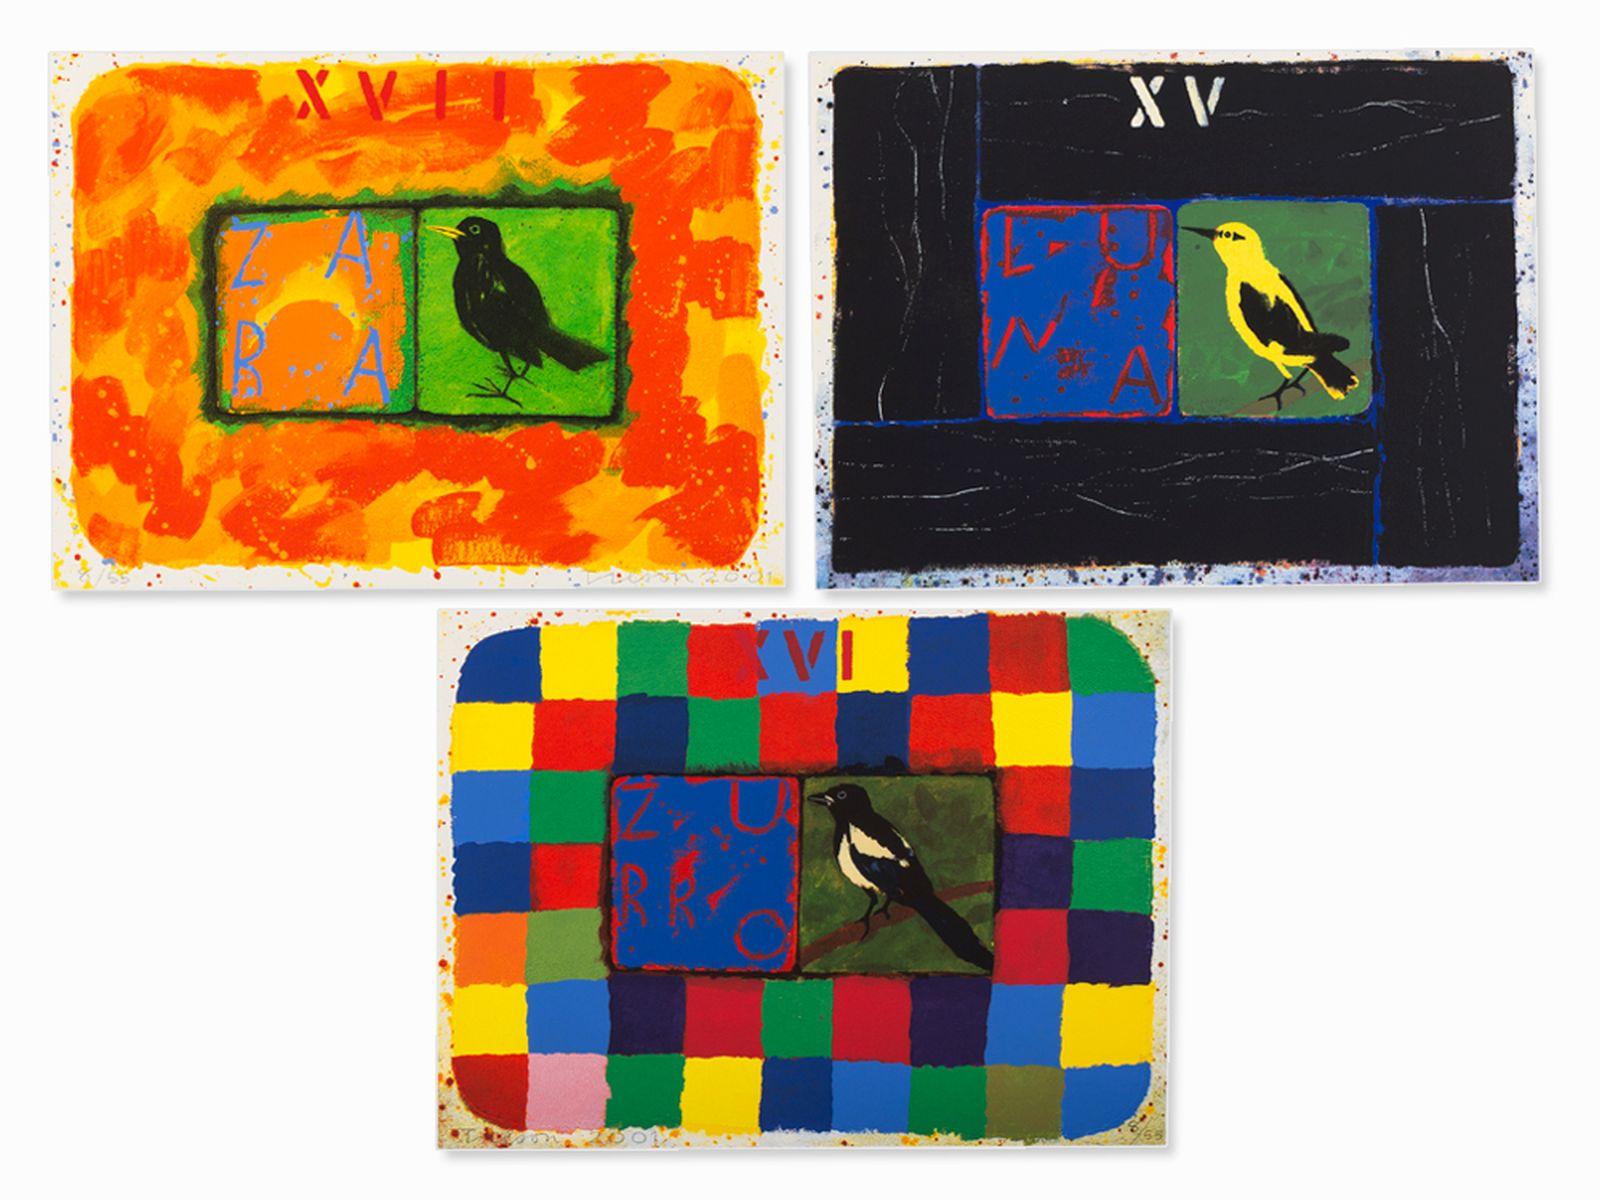 #21 Joe Tilson, Conjunctions, 3 Serigraphs in Colors, 2001 | Joe Tilson (geb. 1928) , Conjunctions, 3 Farbserigrafien, 2001 Image